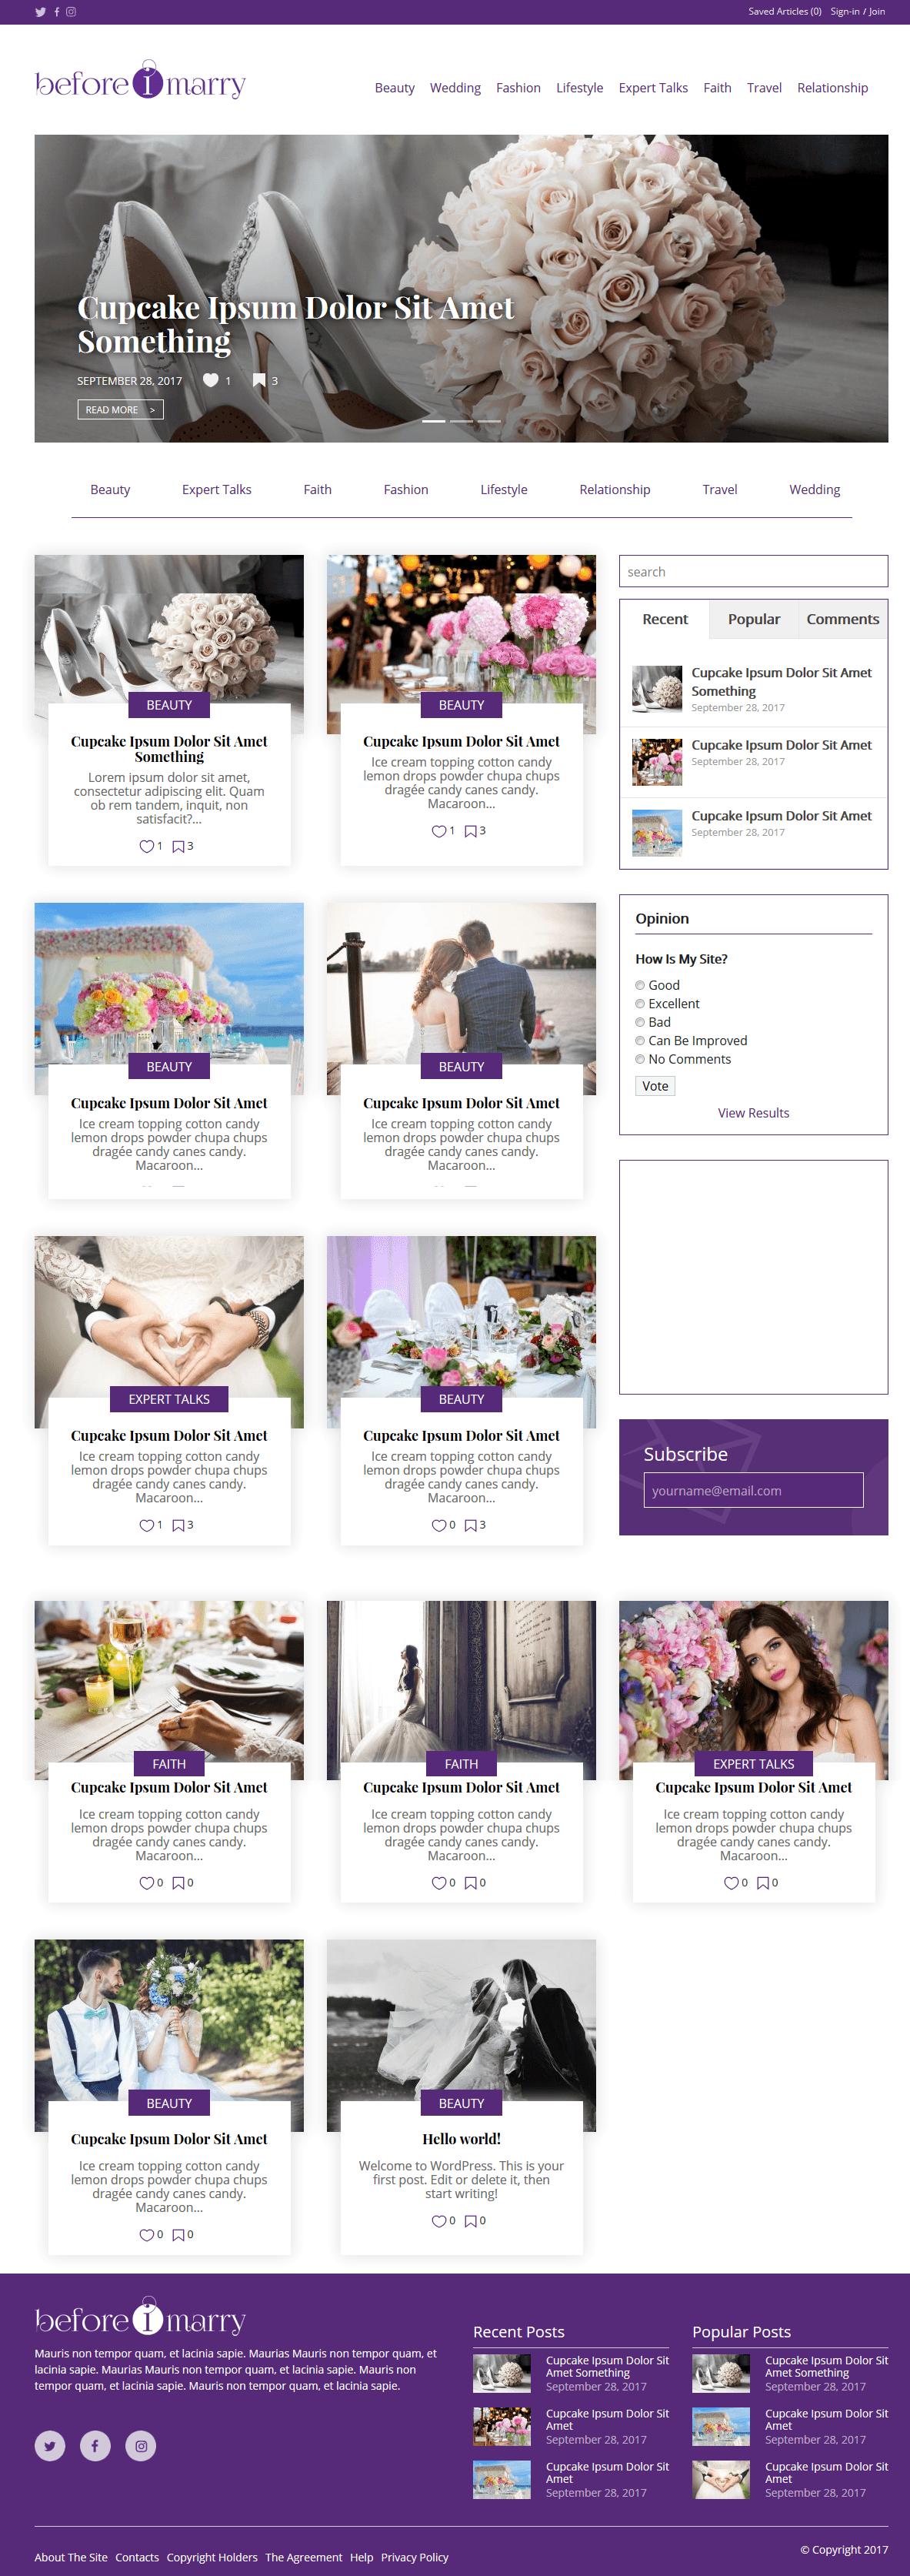 BIM Homepage